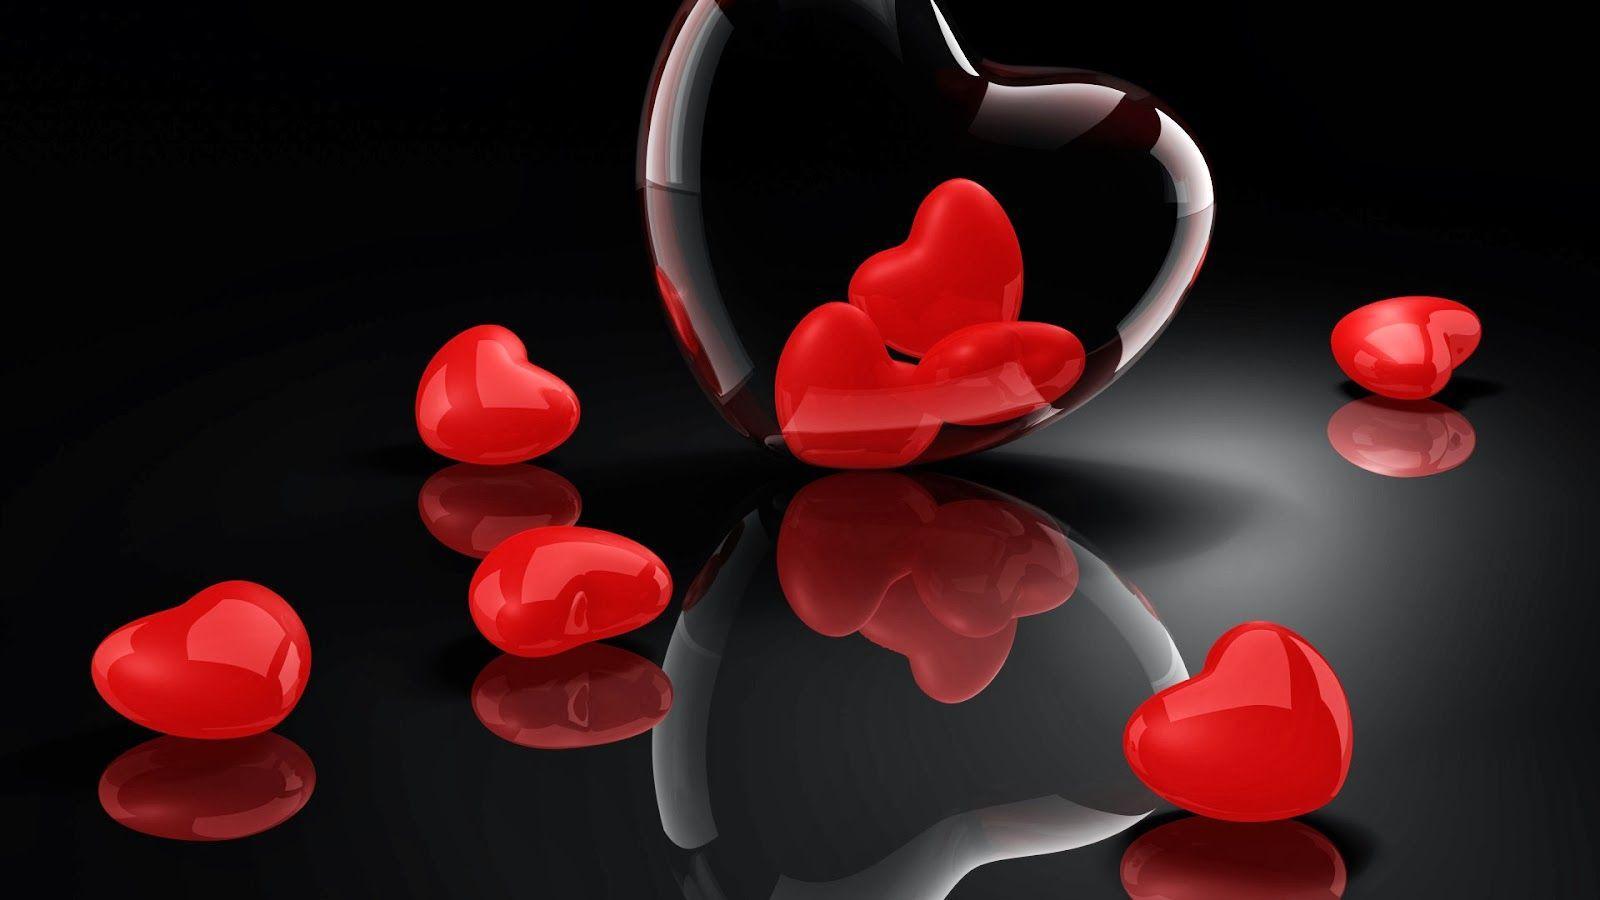 1600x900 Happy Valentines Day Romantic Heart HD Wallpaper